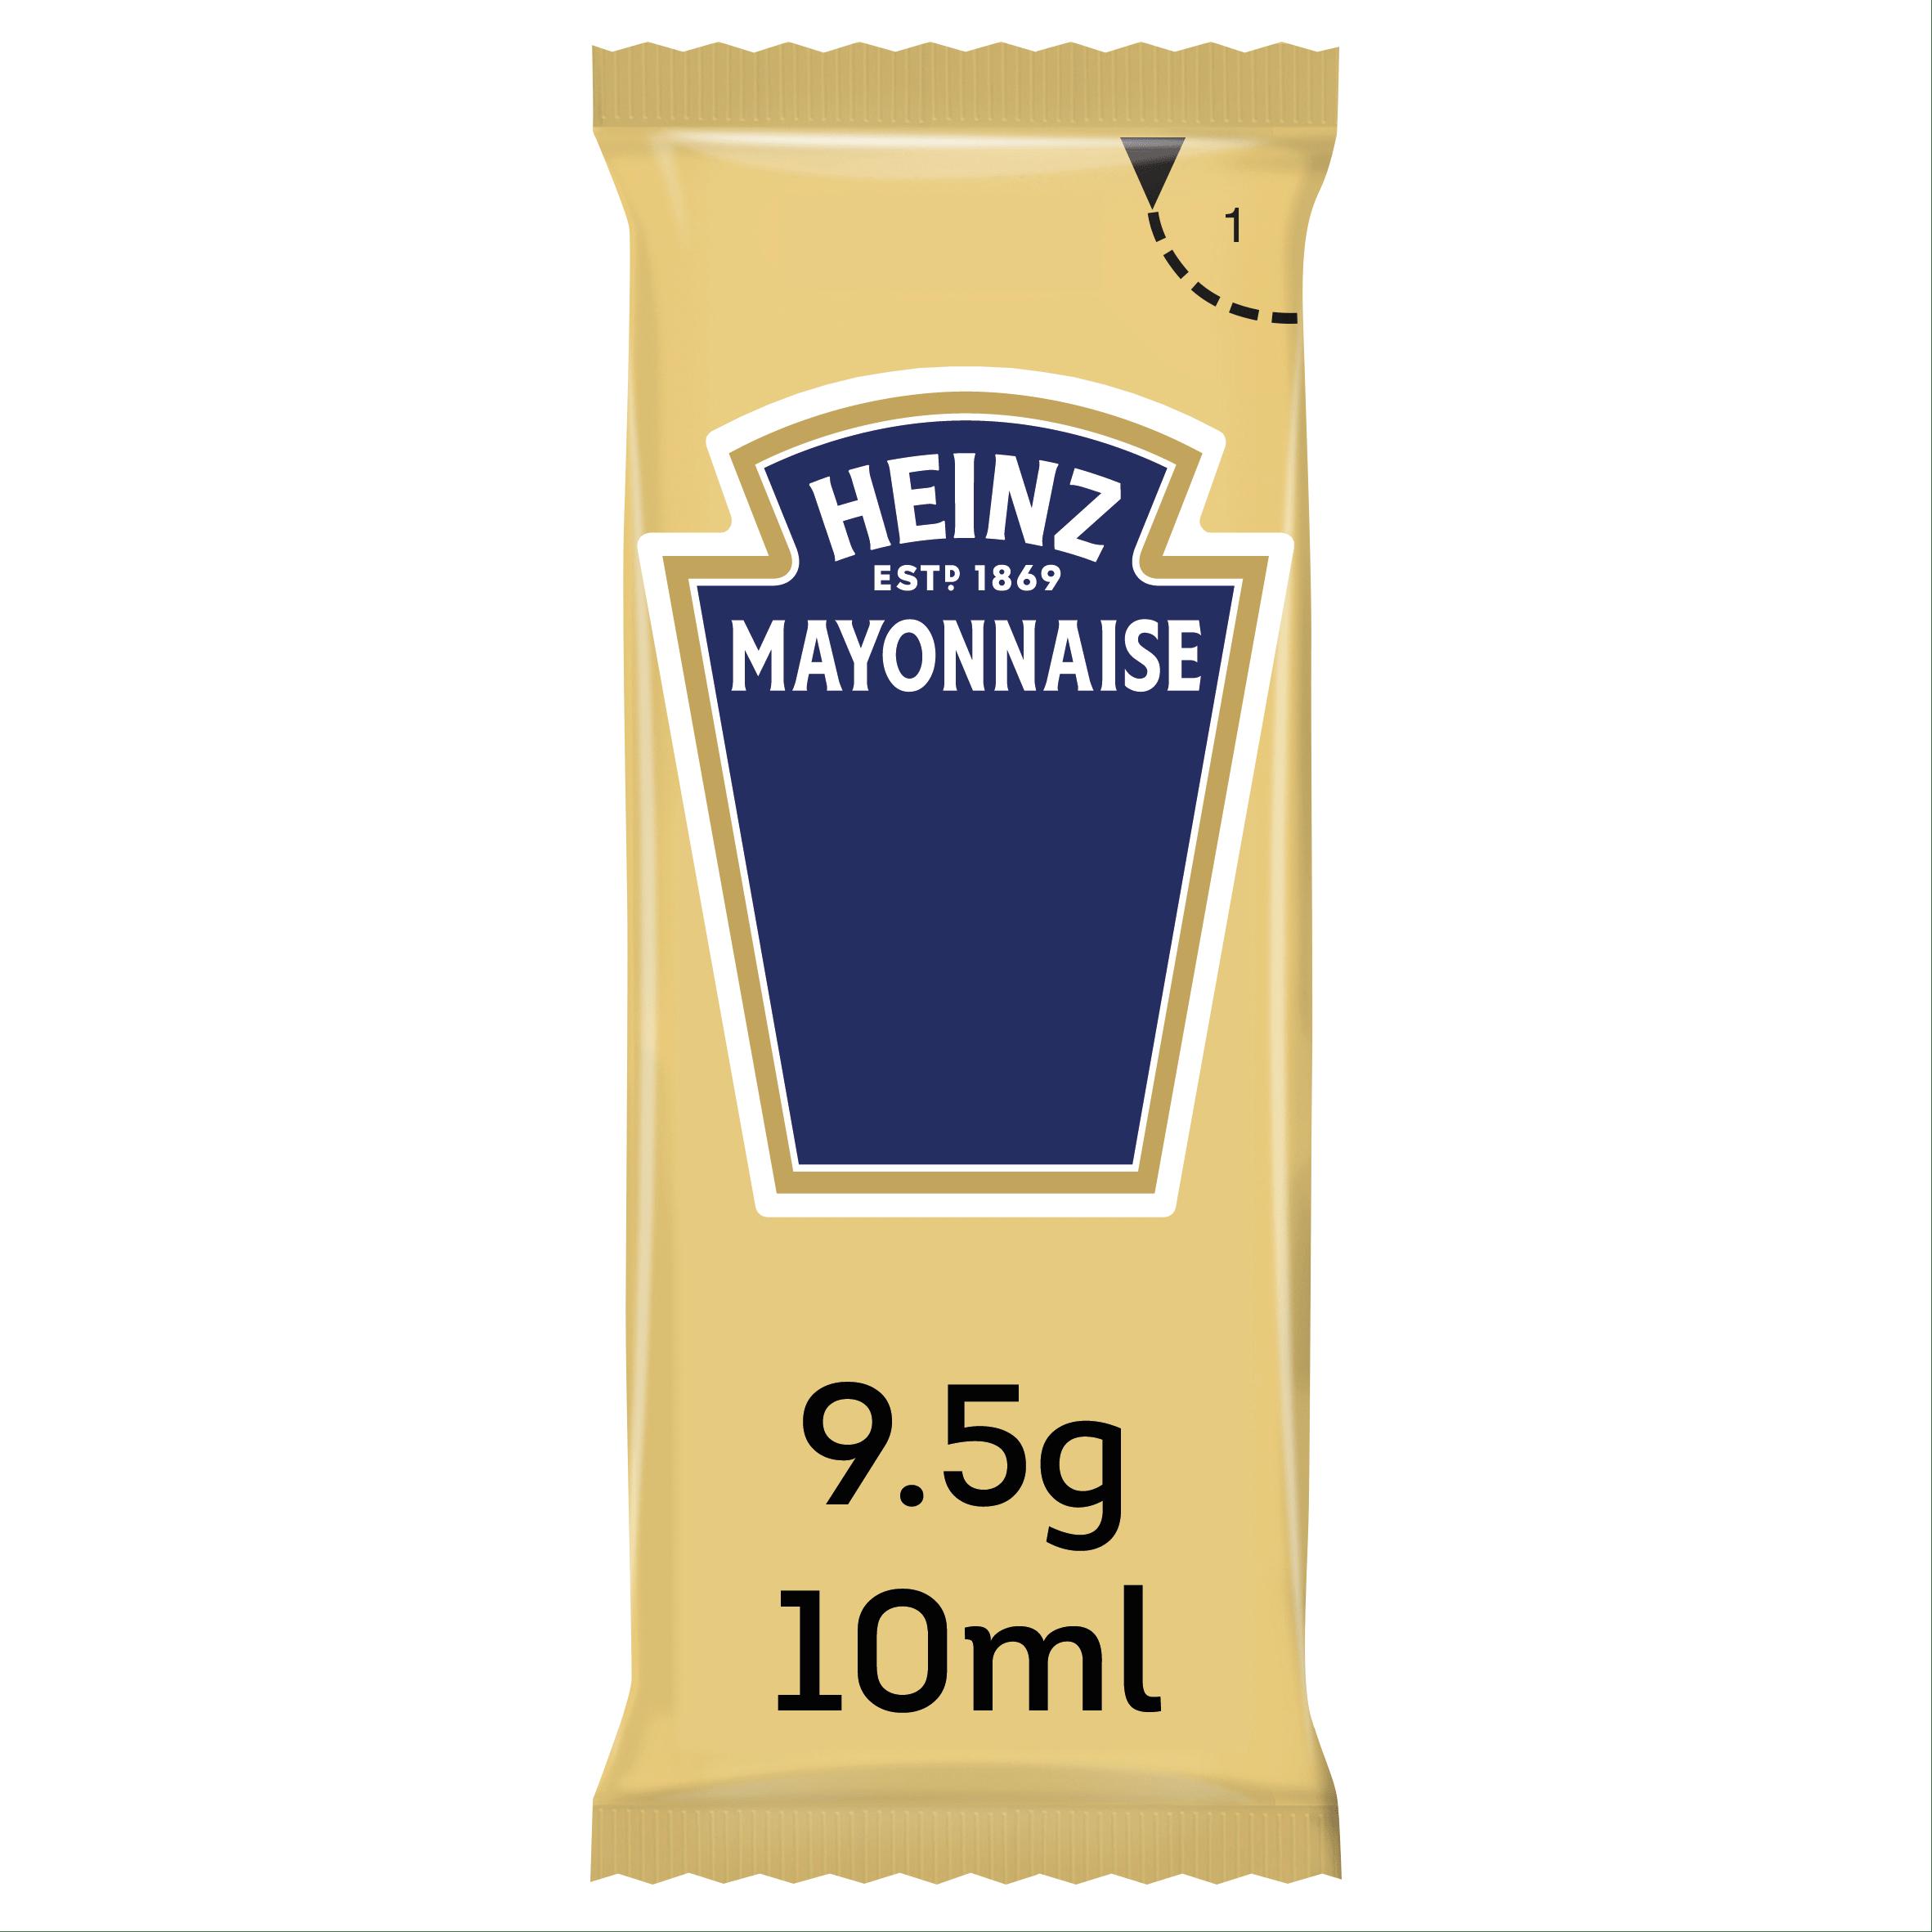 Heinz Mayonnaise 10ml image